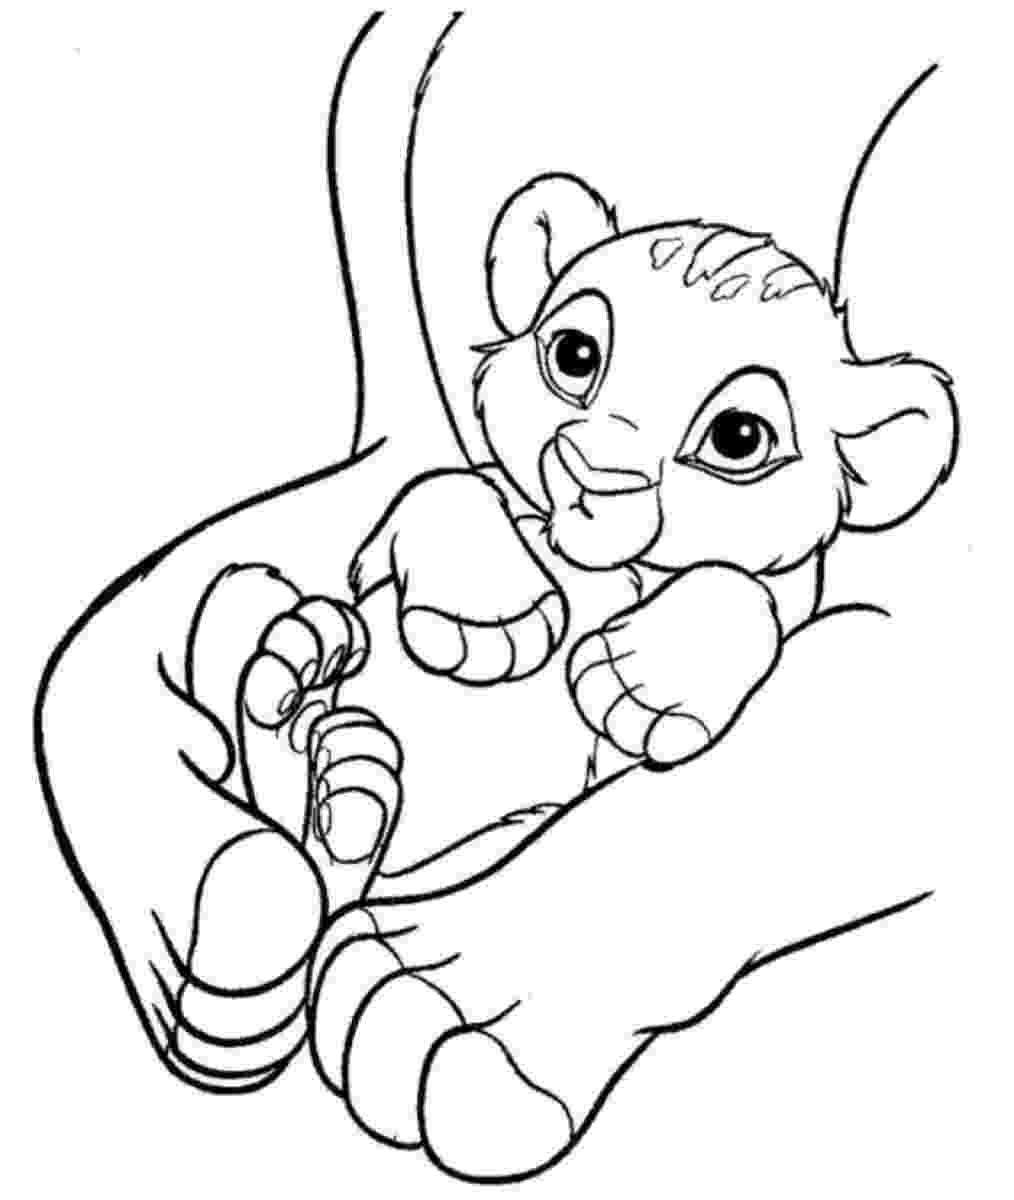 simba coloring sheet free printable simba coloring pages for kids sheet coloring simba 1 1